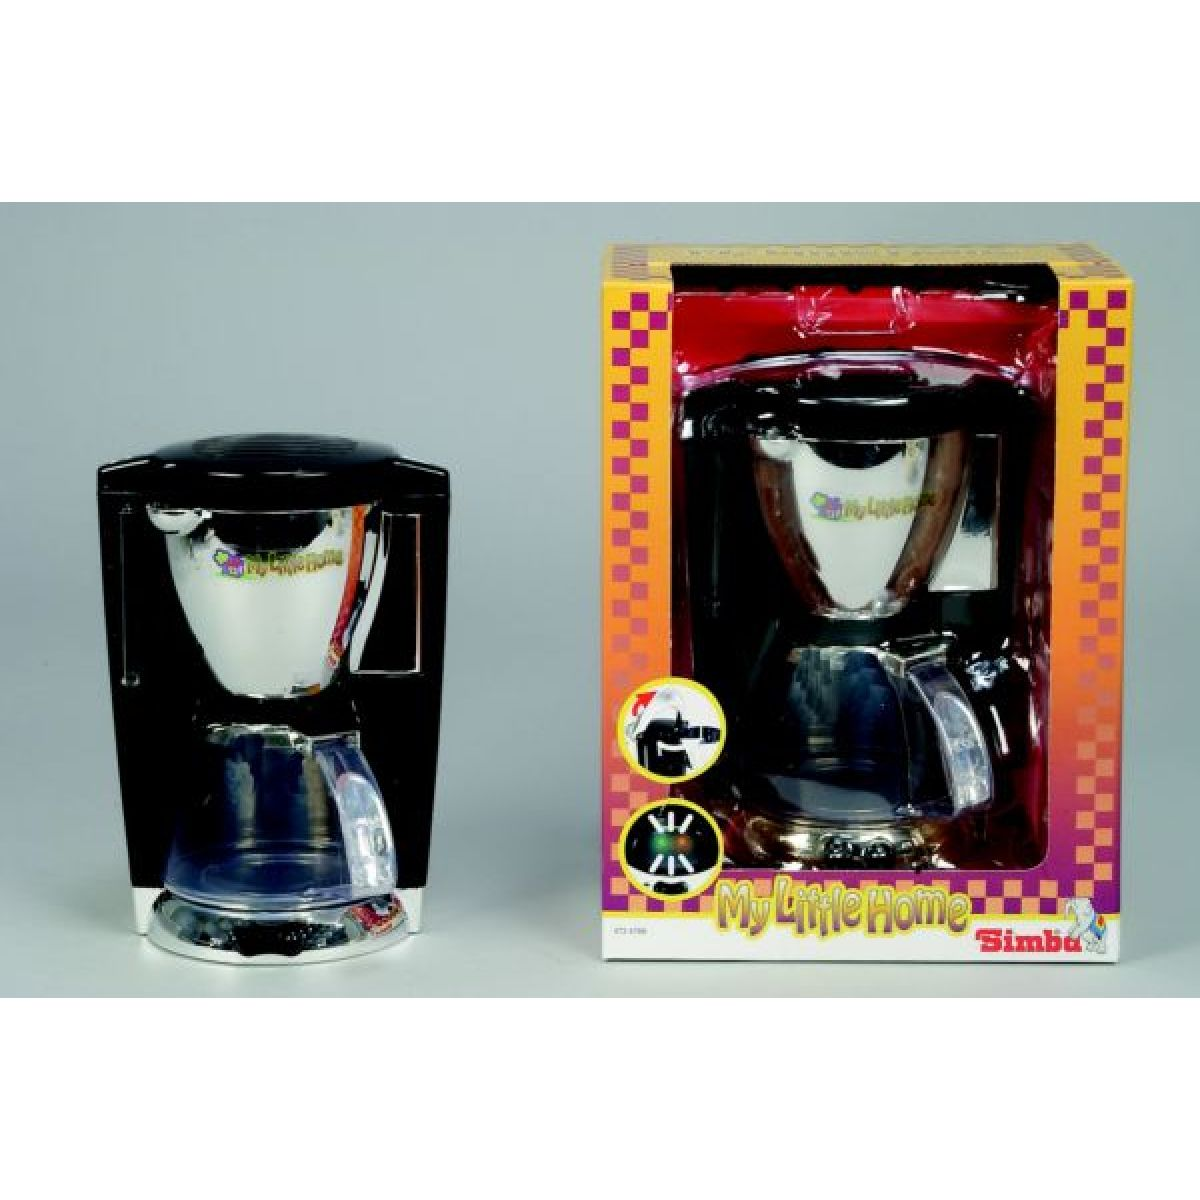 Kávovar chrom Simba